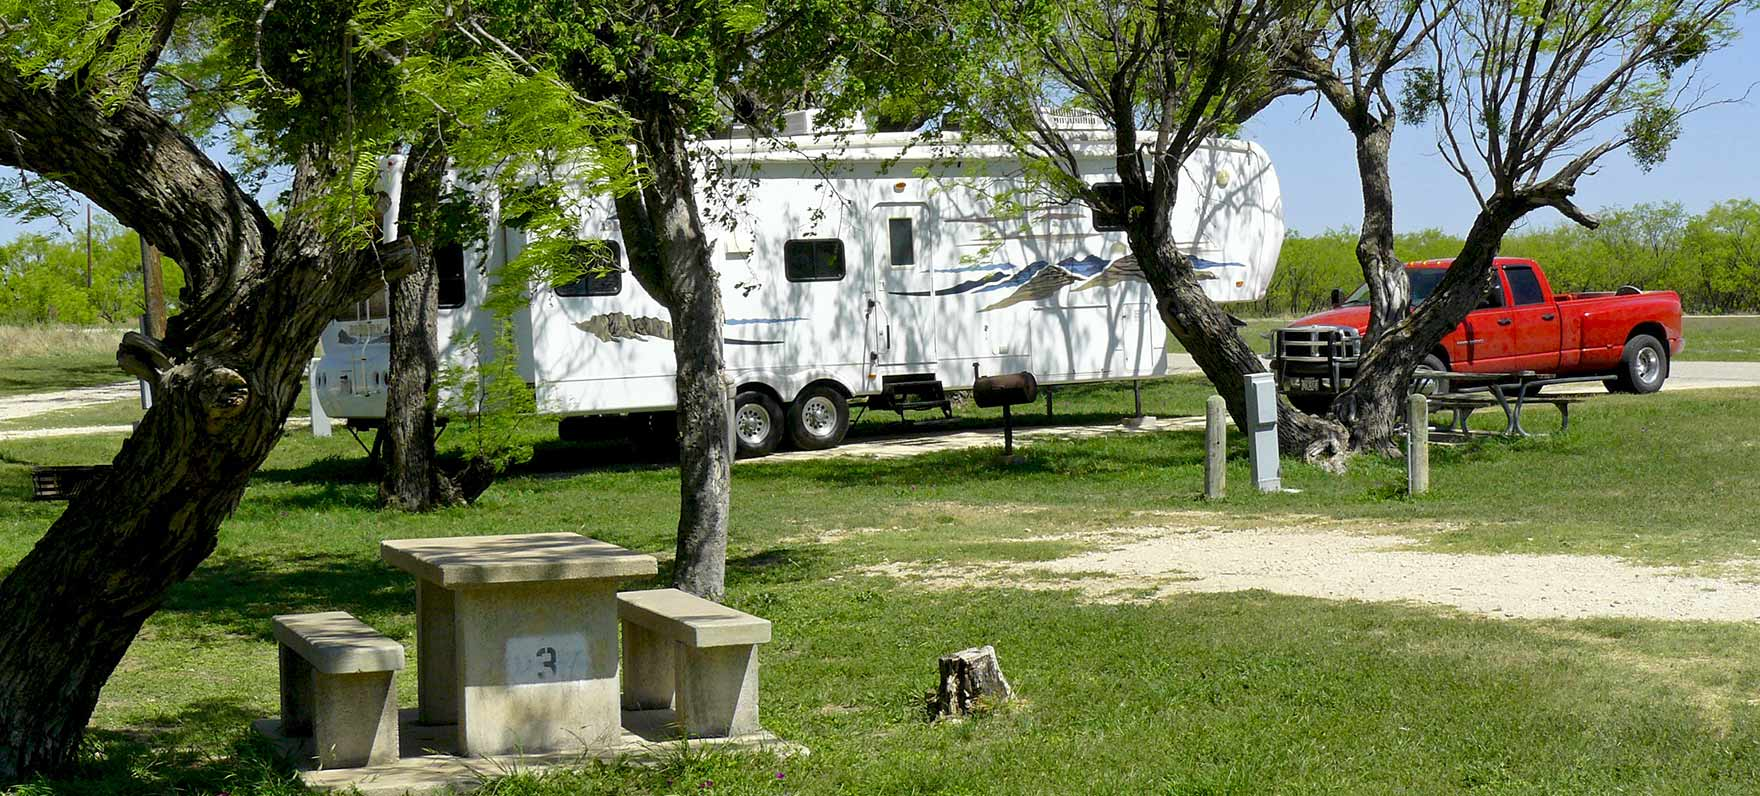 San Angelo State Park Texas Parks Amp Wildlife Department